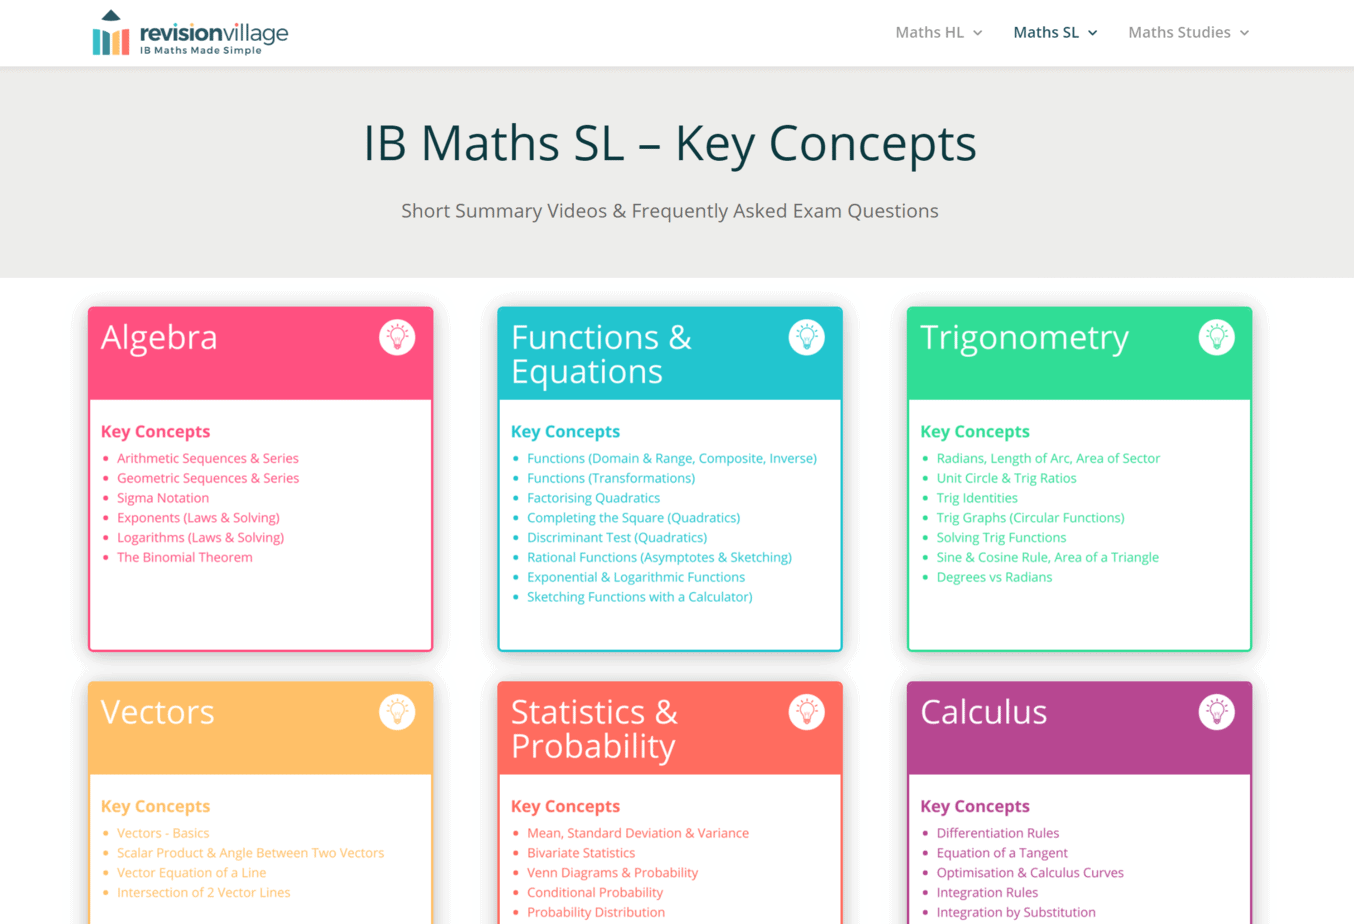 Top IB Resources - Mathematics!